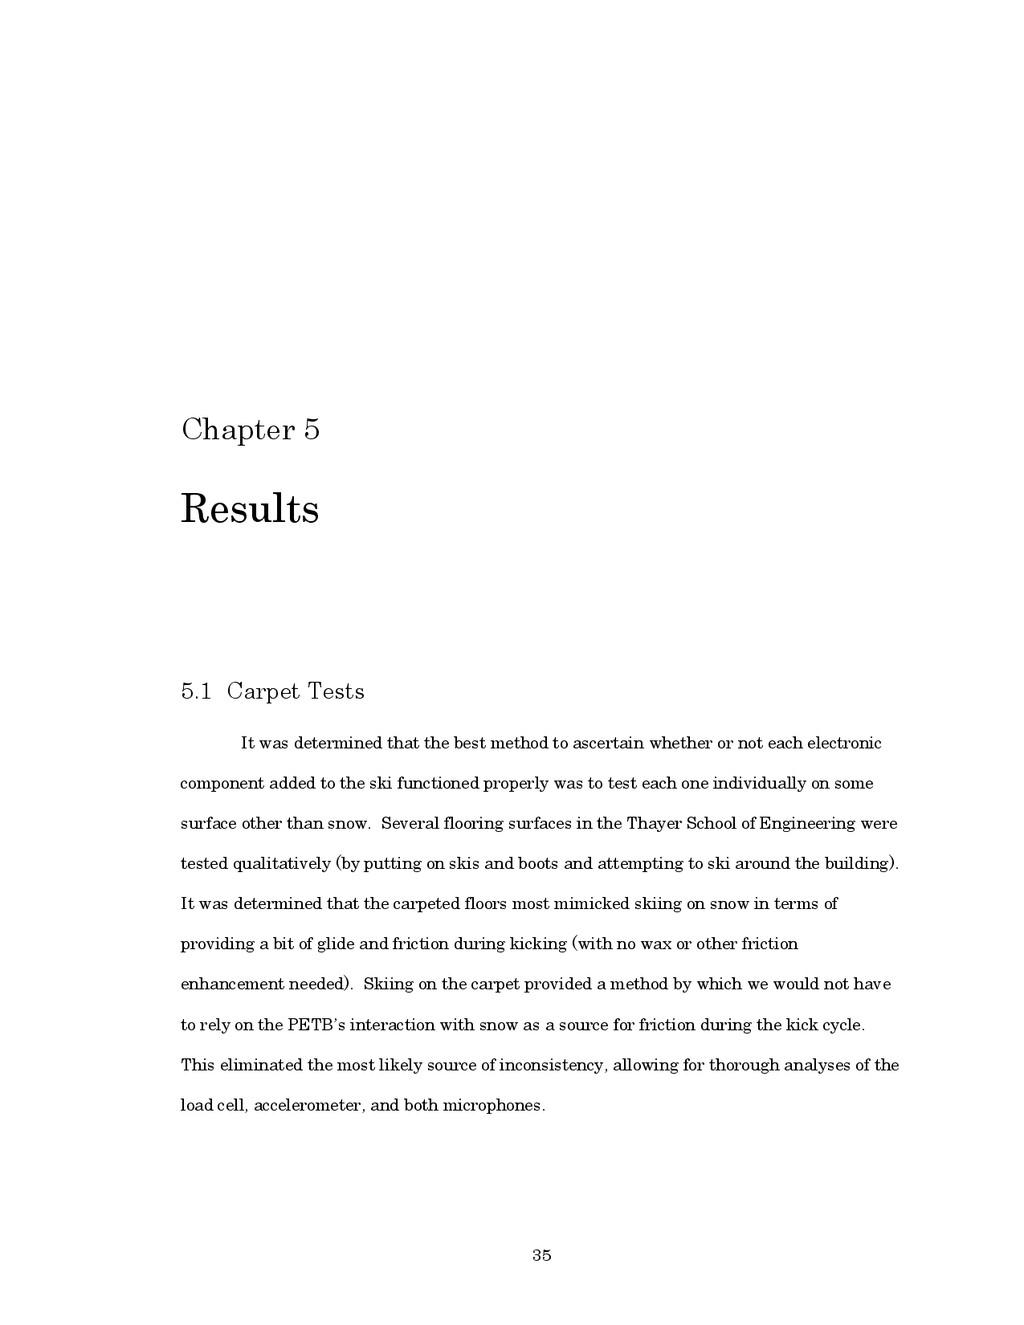 35 Chapter 5 Results 5.1 Carpet Tests It was de...